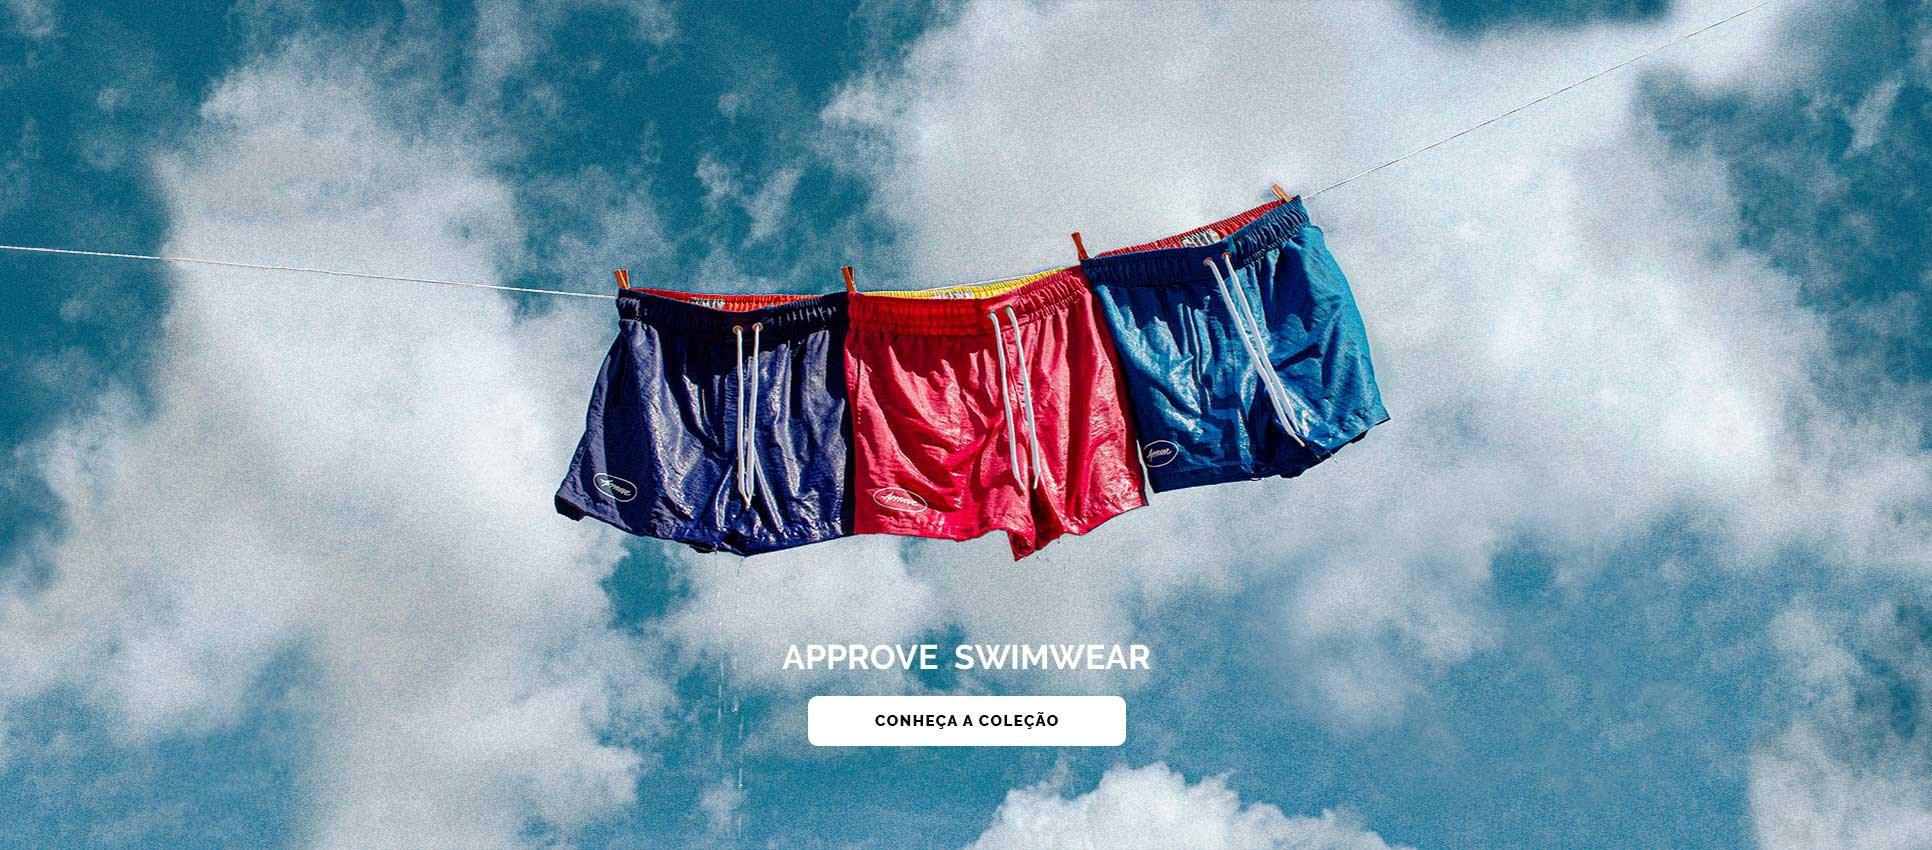 Swimwear - Approve